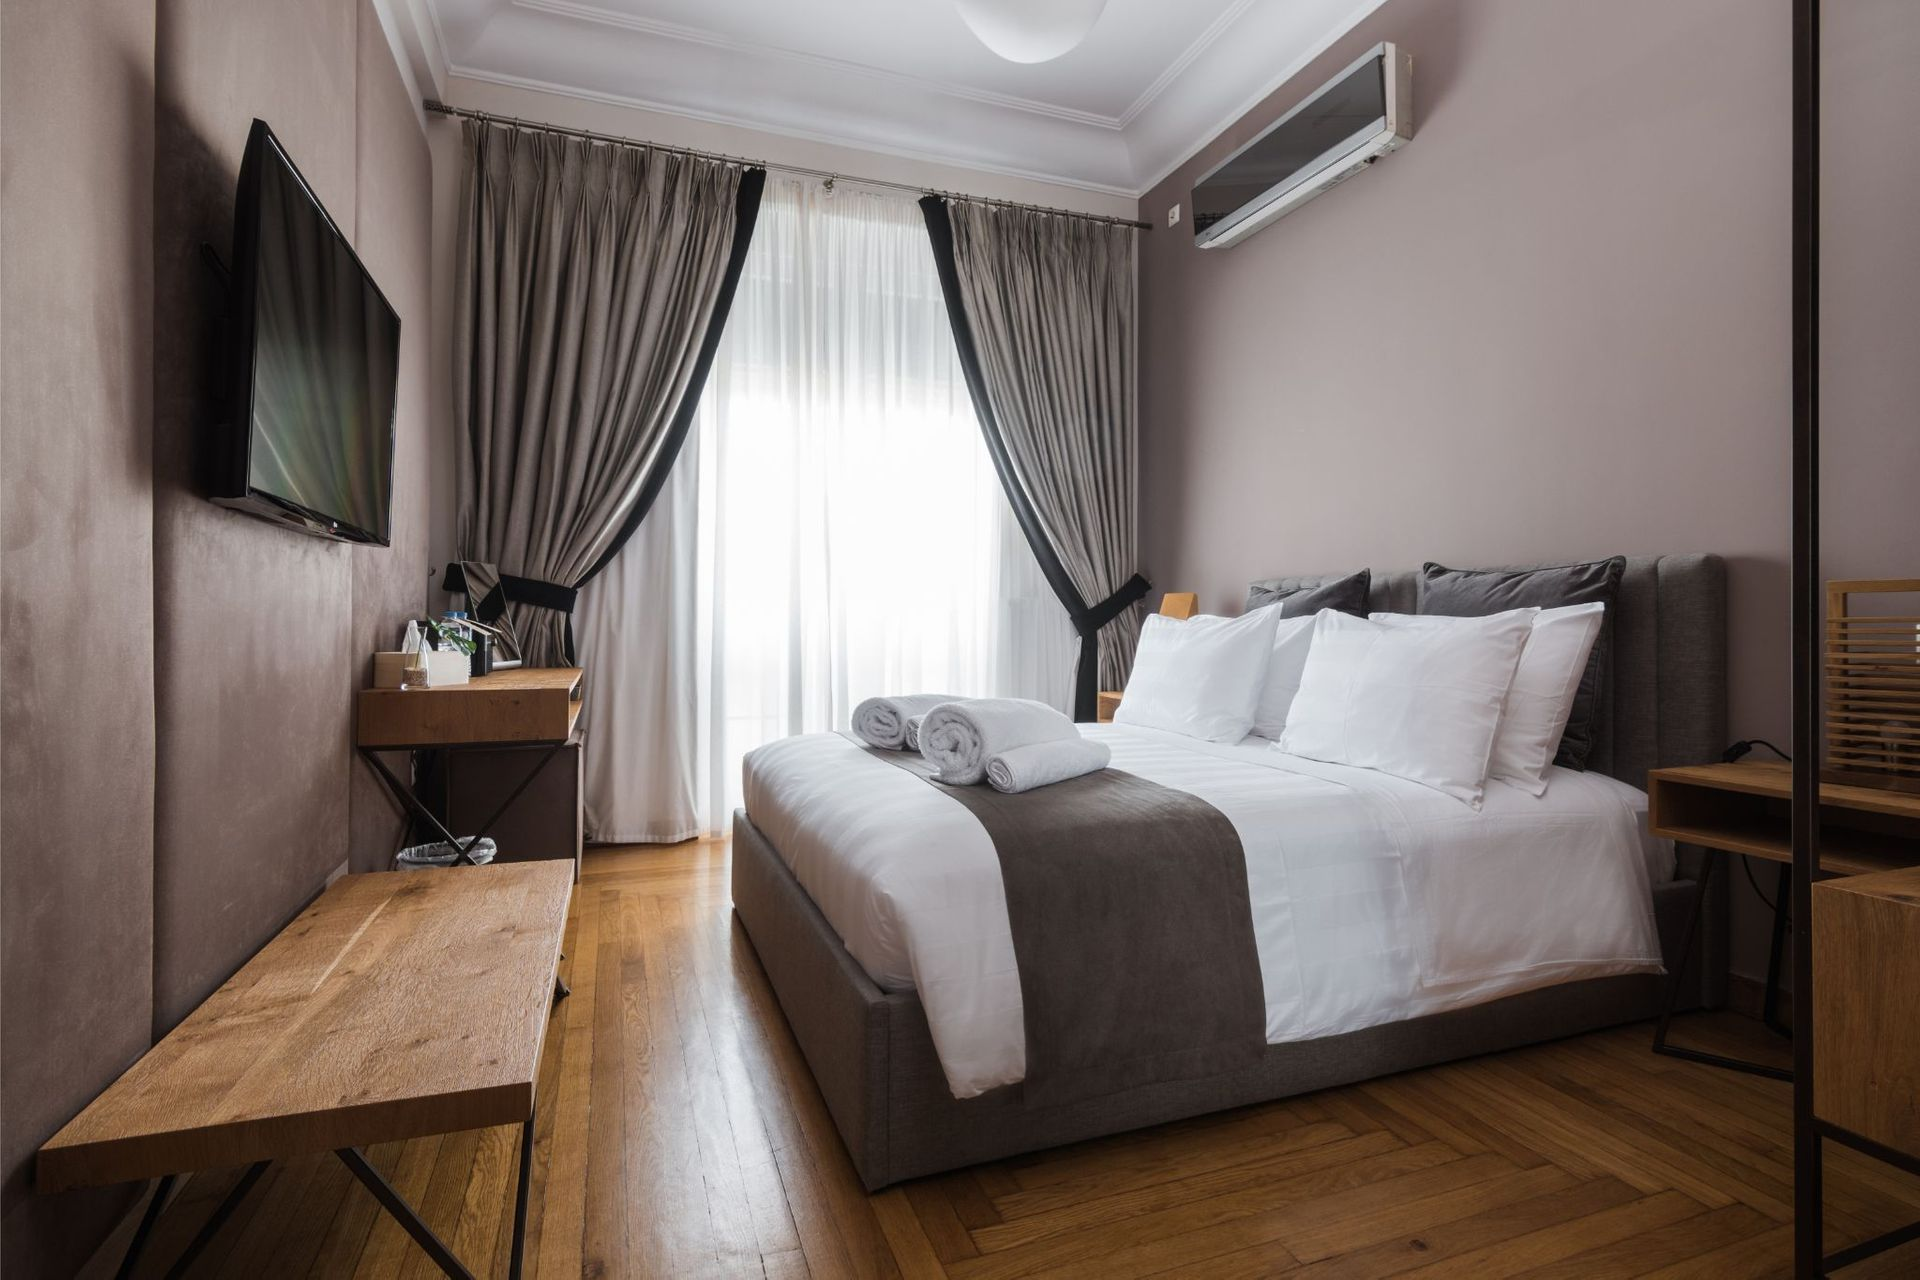 Acropolis Elegant Residence by Bill & John Apartments Athens - Αθήνα ✦ 2 Ημέρες (1 Διανυκτέρευση) ✦ 2 άτομα ✦ Χωρίς Πρωινό ✦ έως 11/09/2021 ✦ Κοντά στο κέντρο της πόλης!